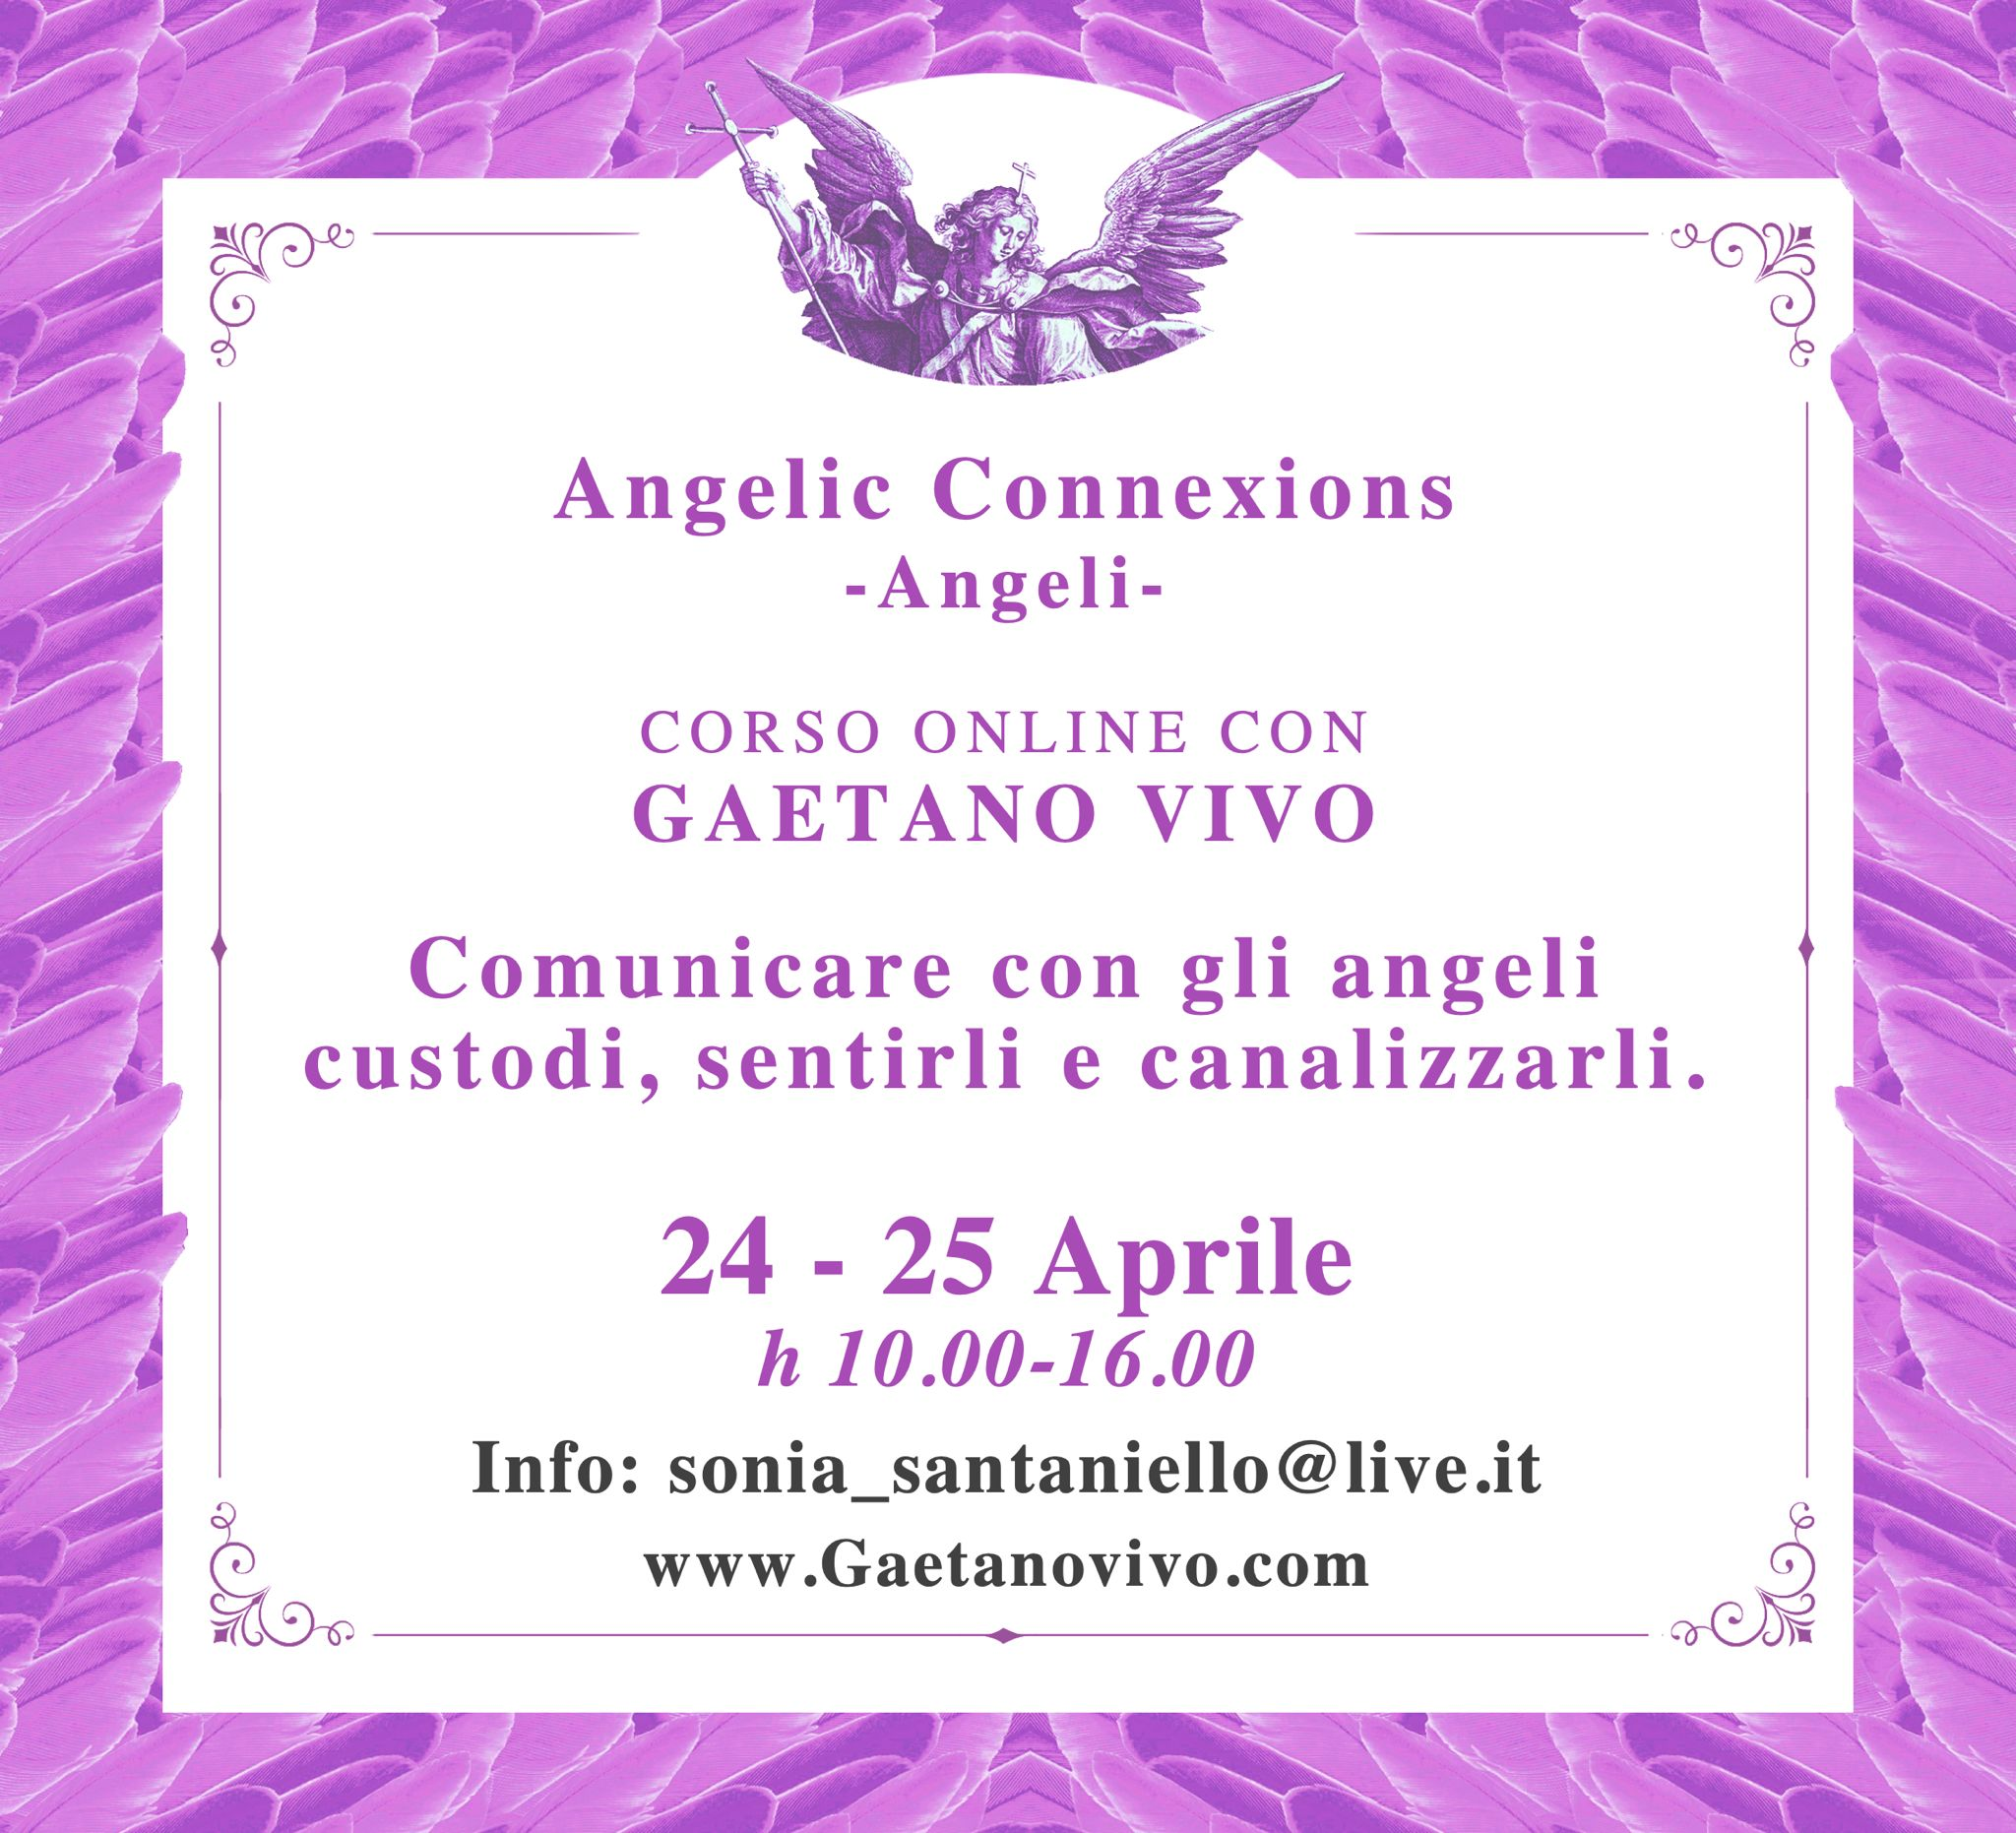 angelic connexions 24 25 aprile